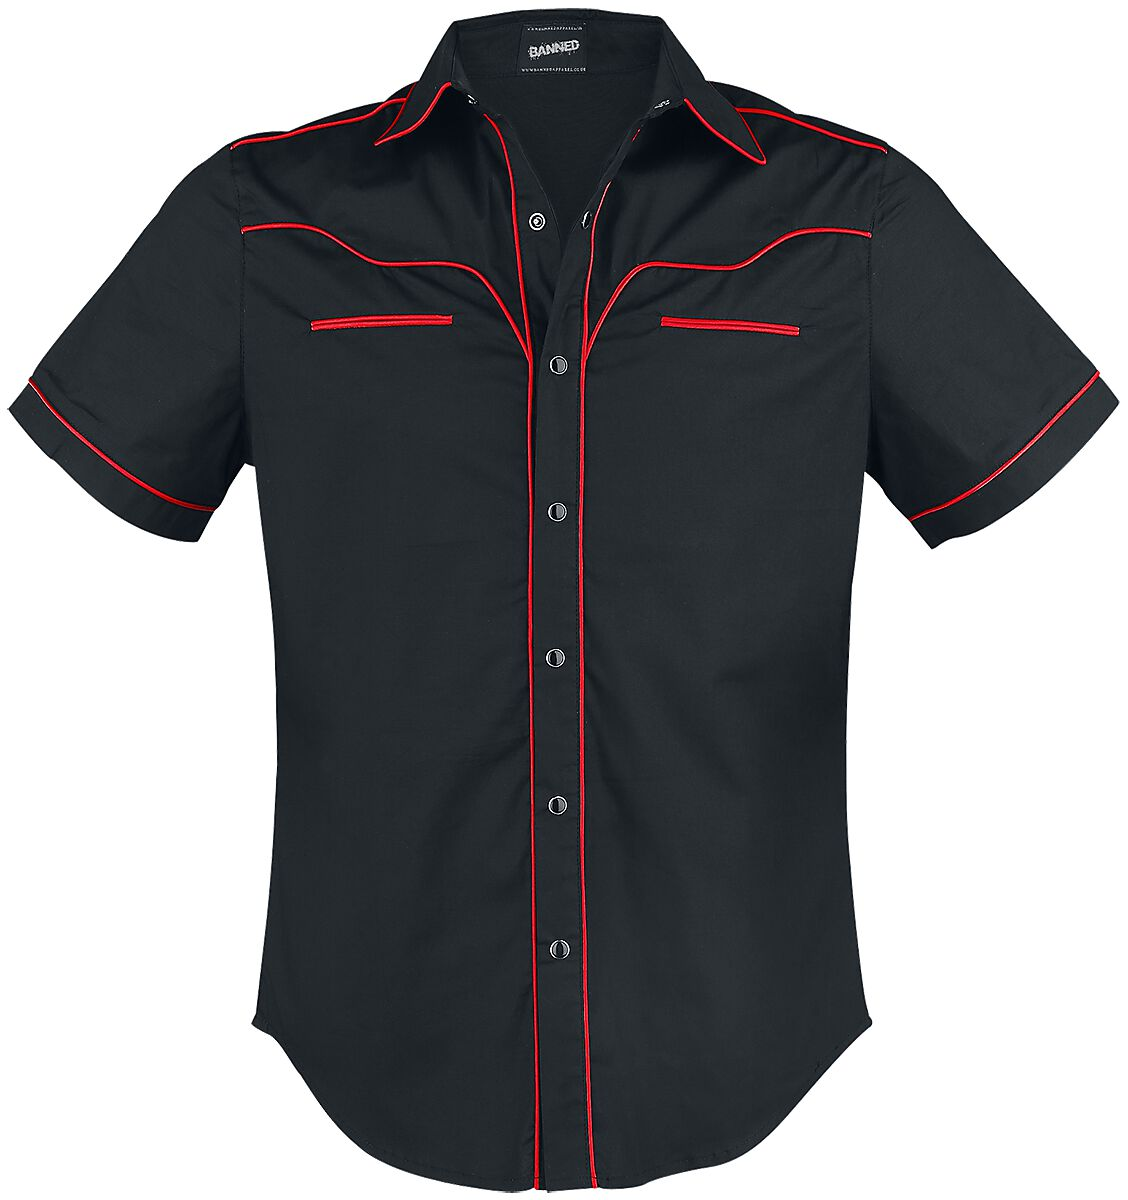 Image of   Banned Plain Trim Skjorte sort-rød